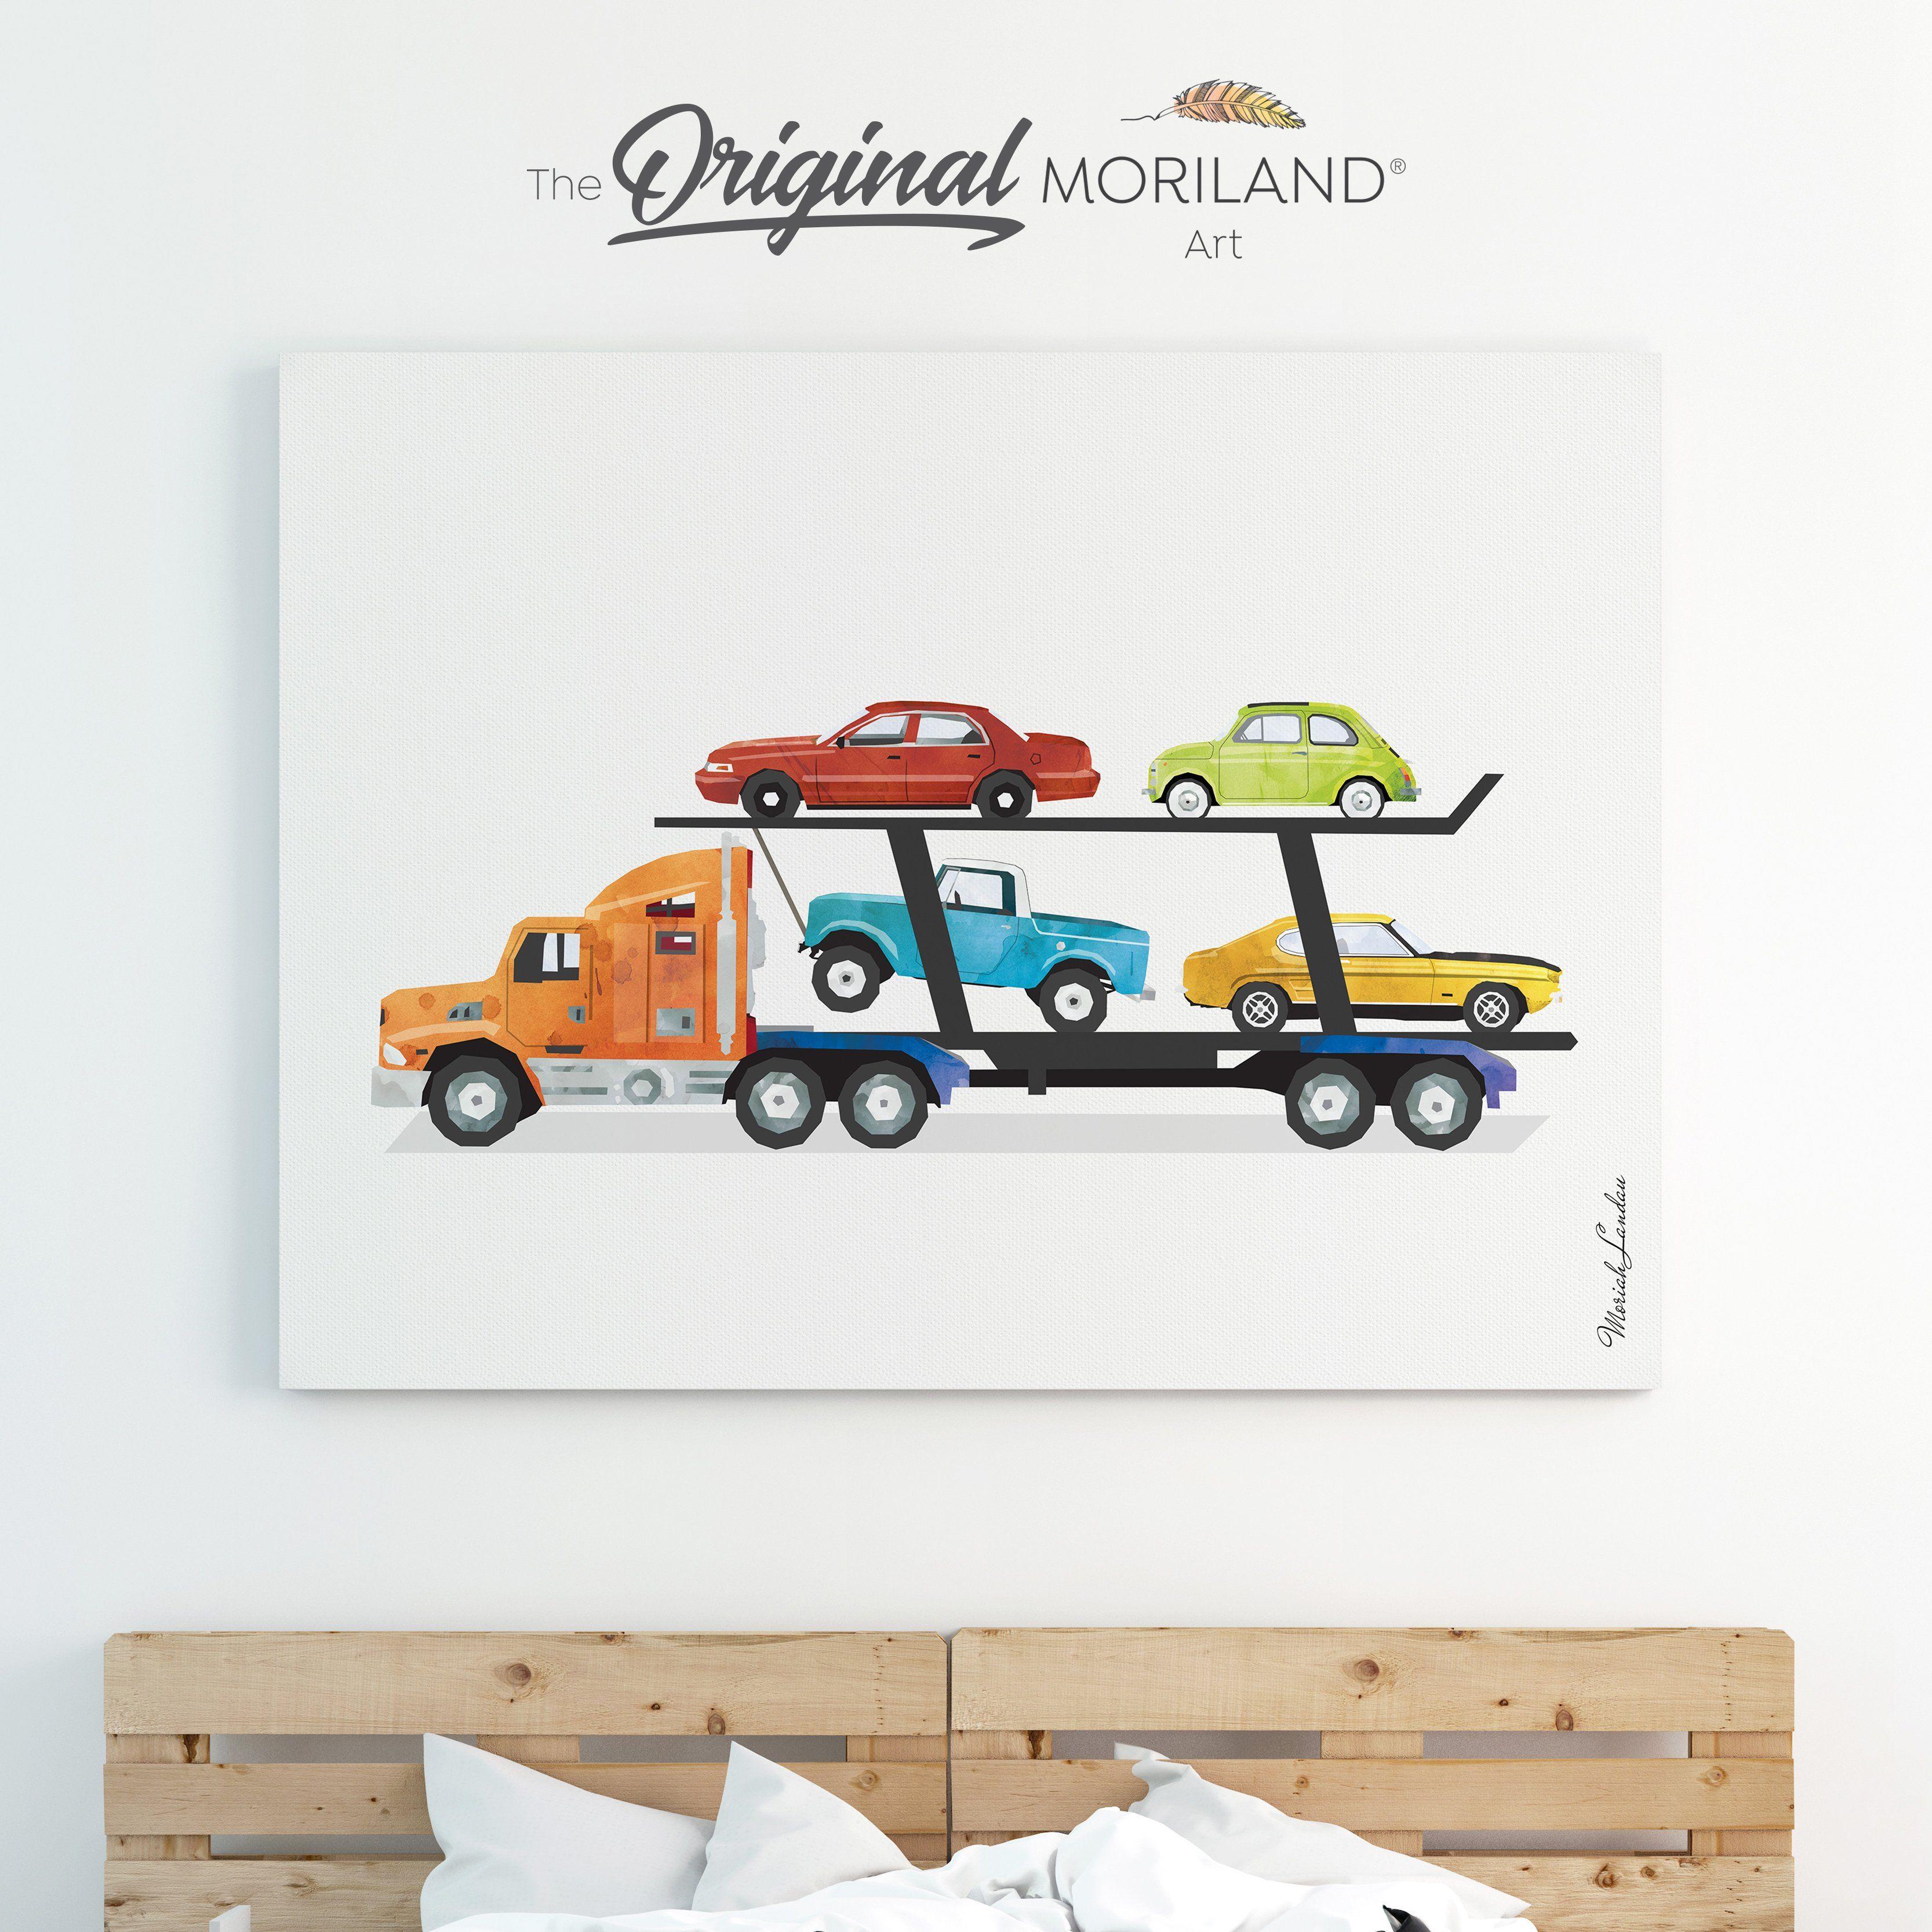 Car Print Transportation Wall Decor Boy Toddler Room Decor Watercolor Decor 4x4 Car Vertical Print Lifted Truck Wall Art Printable